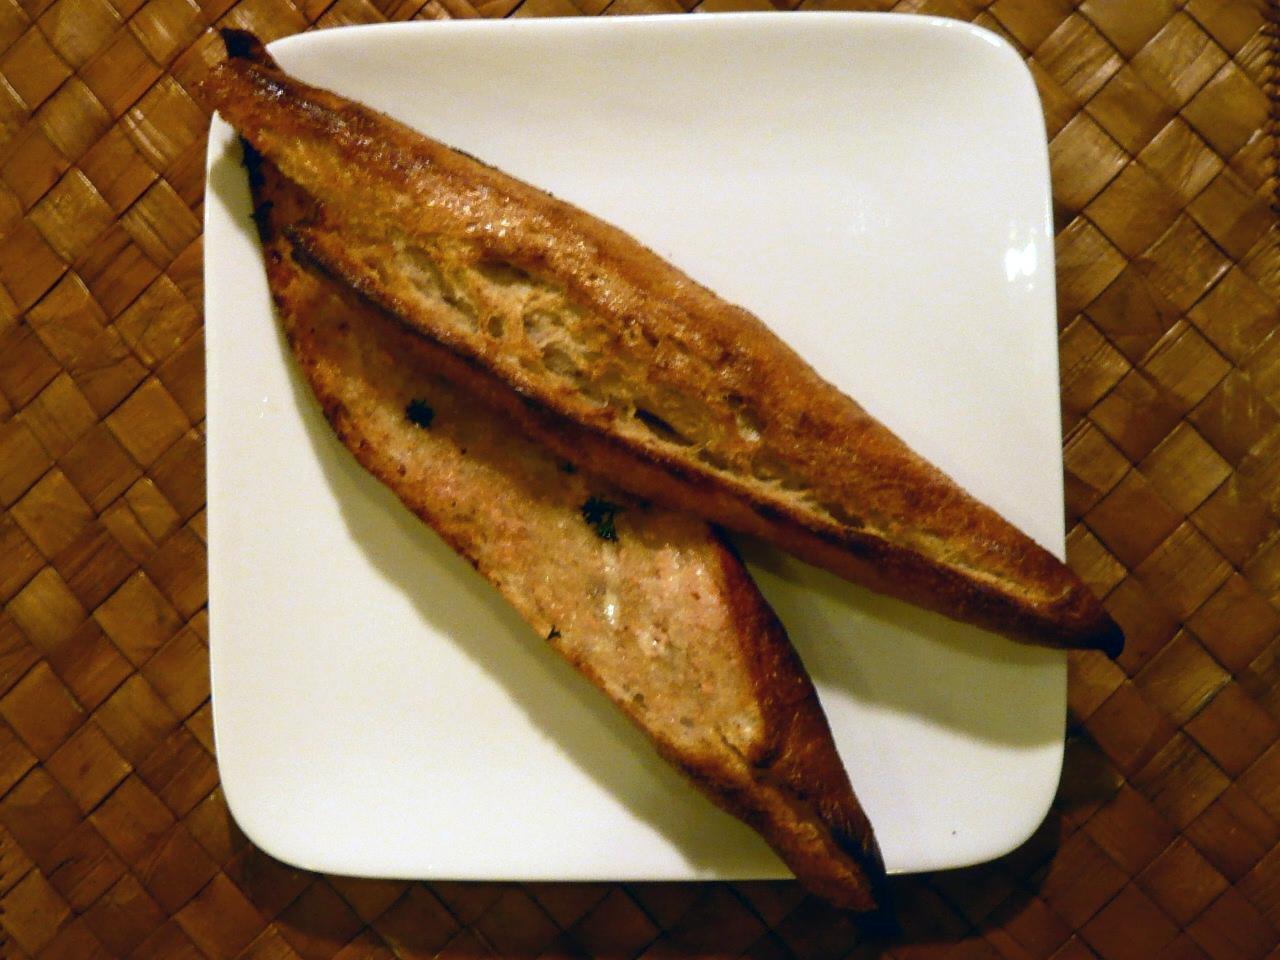 O-ba'sh crust